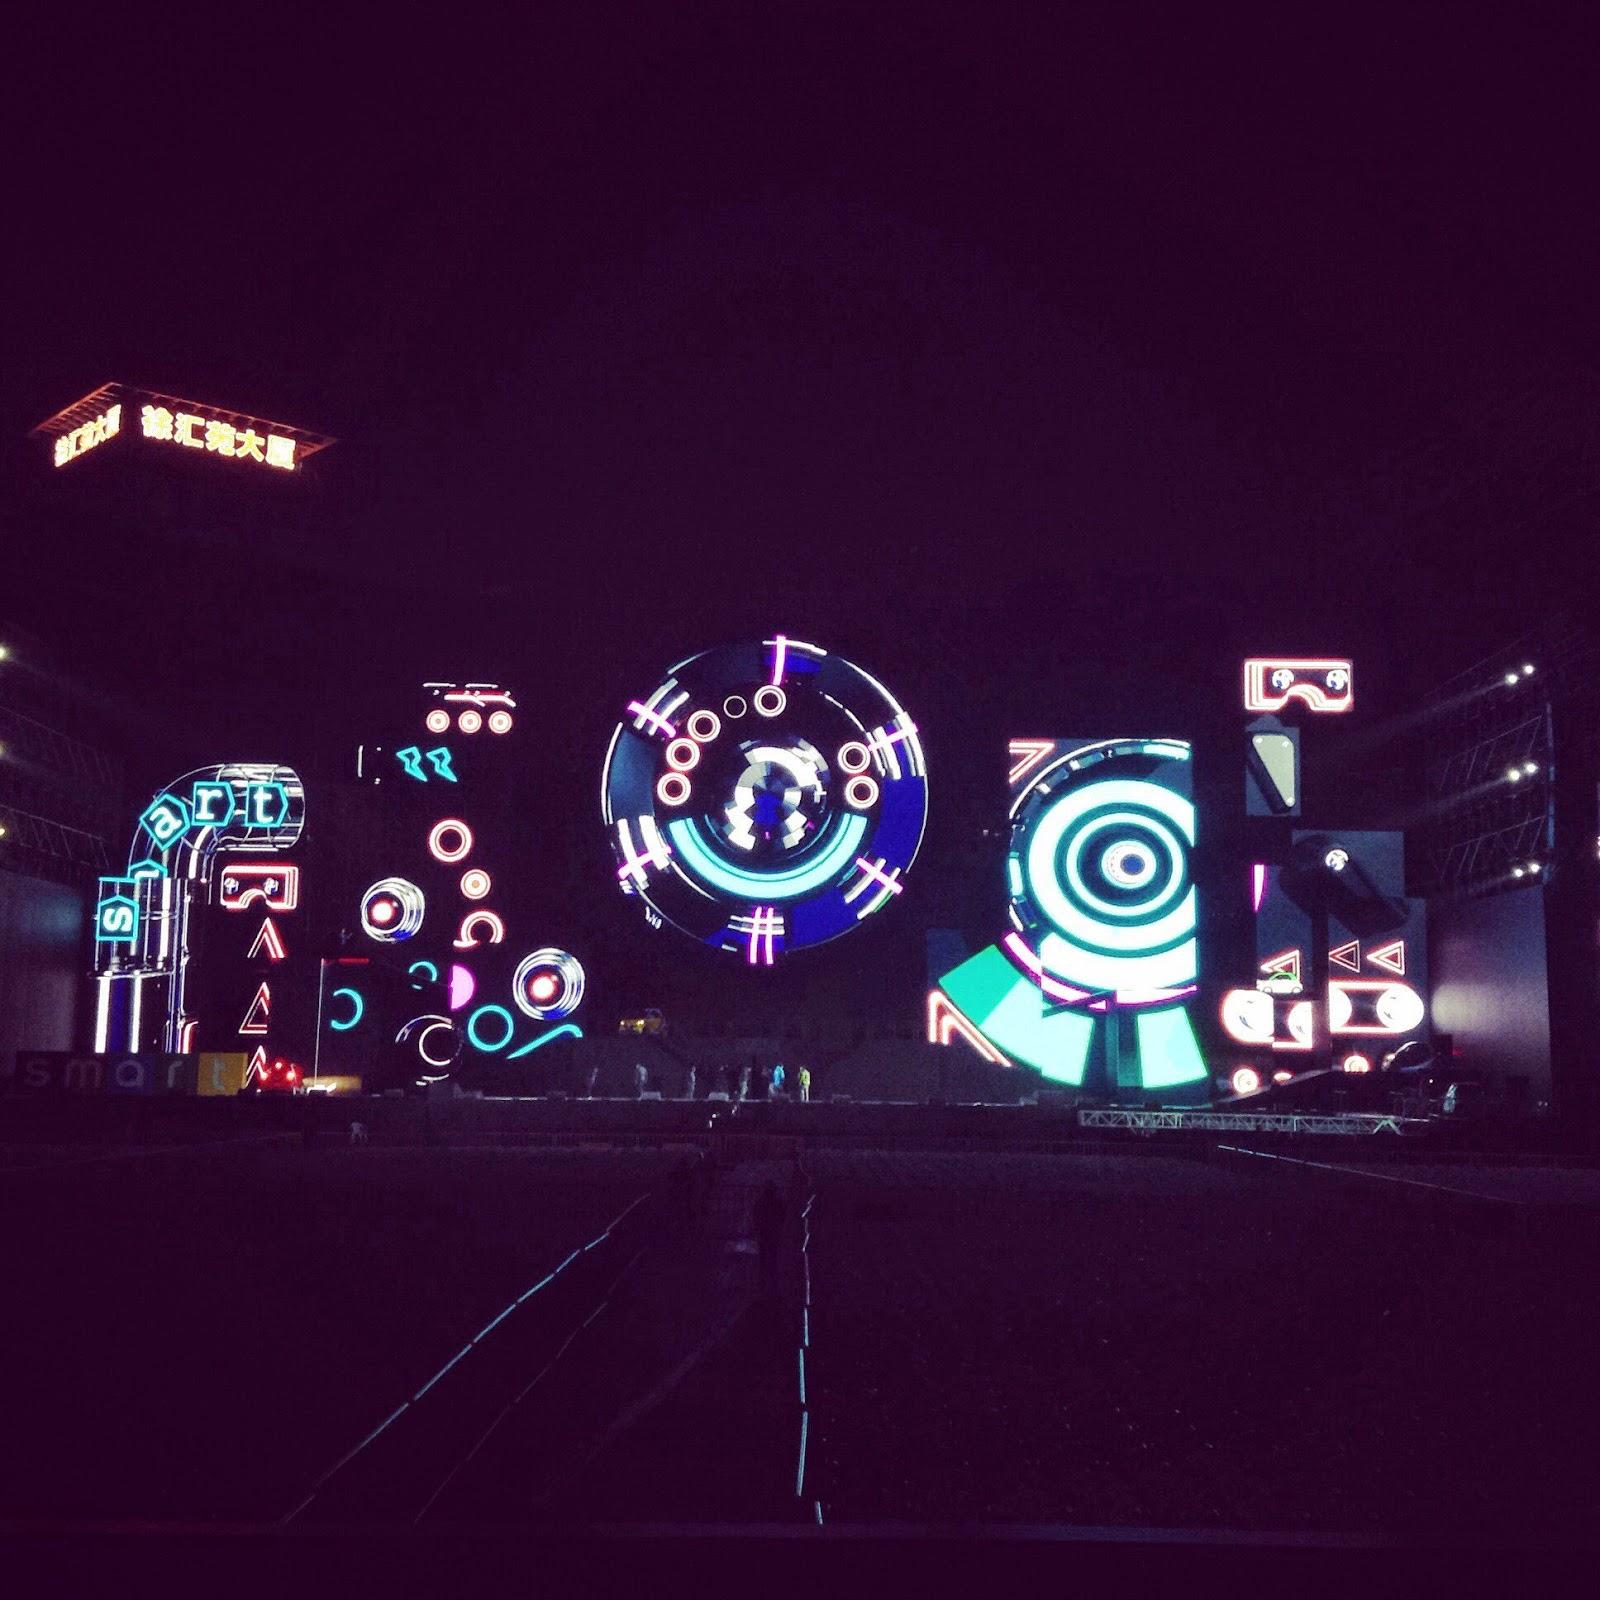 Rain 本日上海にてSmart China 5th Anniversary コンサート_c0047605_15415660.jpg